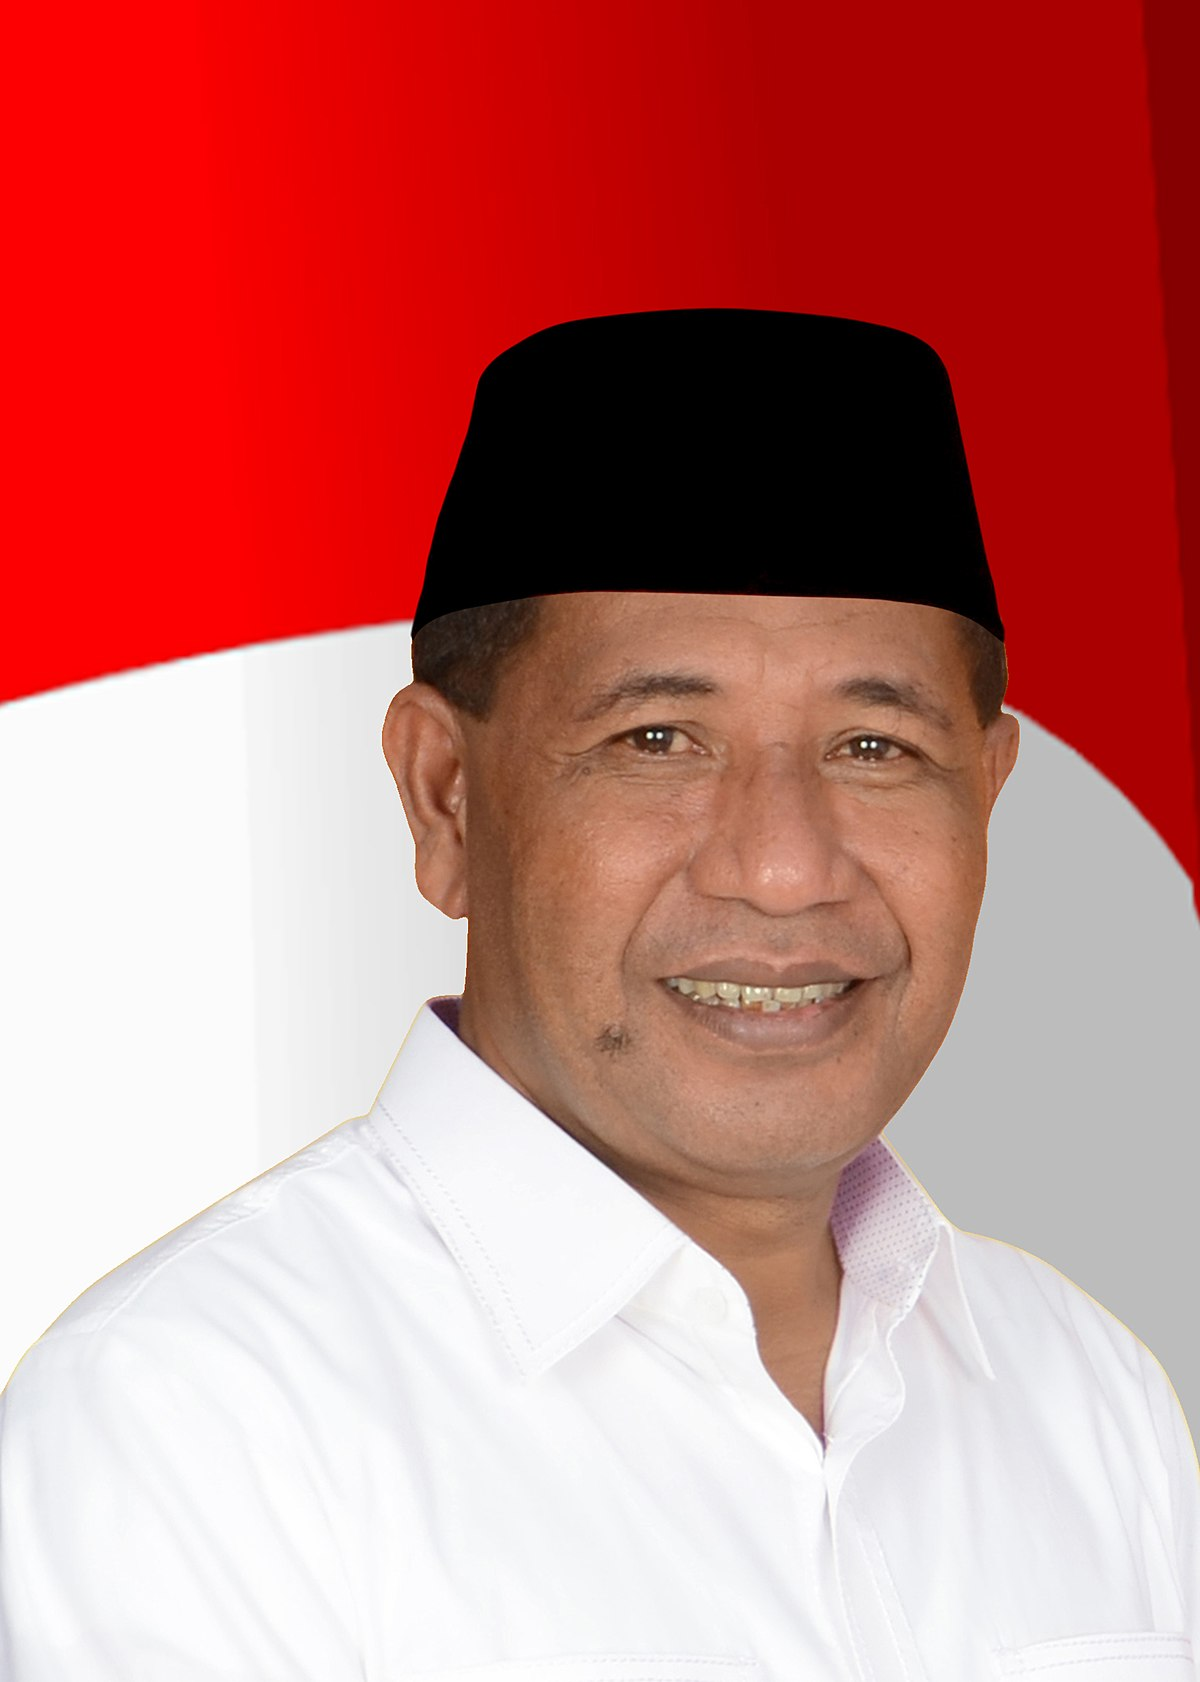 Daftar Bupati Halmahera Tengah - Wikipedia bahasa ...